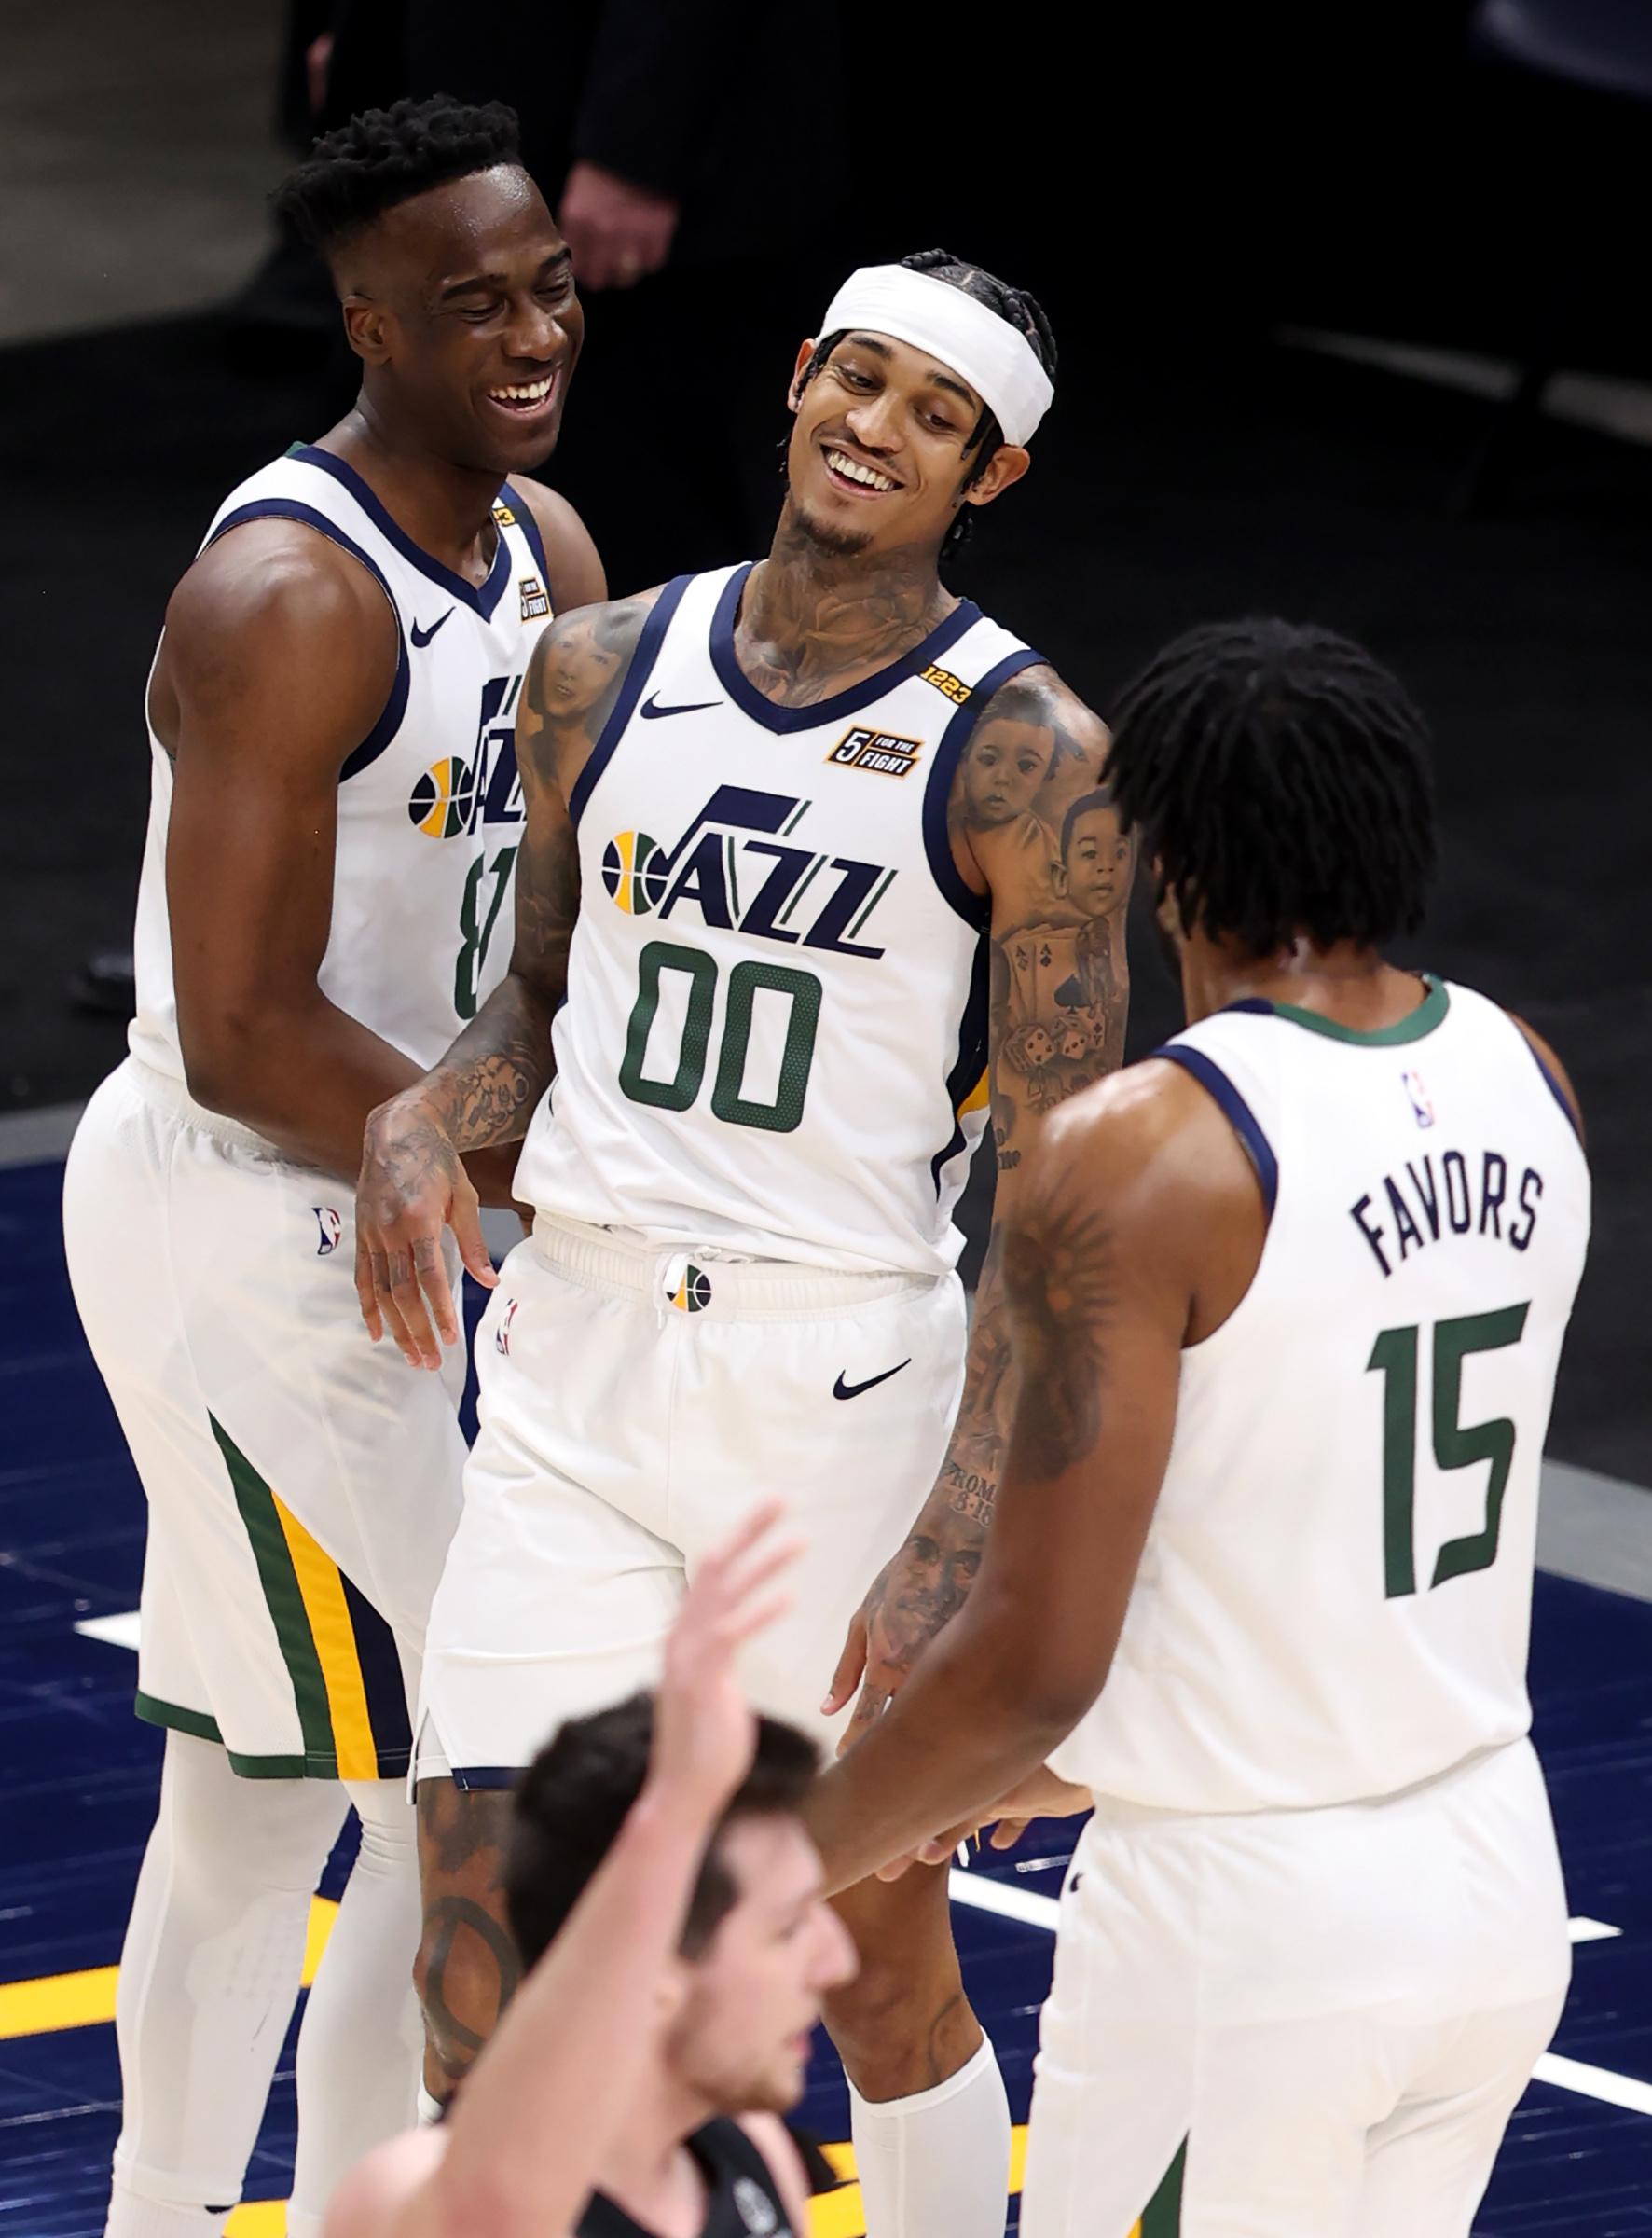 Utah Jazz guard Miye Oni (81) laughs with Utah Jazz guard Jordan Clarkson (00) after a circus shot as the Utah Jazz and the San Antonio Spurs play an NBA basketball game at Vivint Arena in Salt Lake City on Wednesday, May 5, 2021. Utah won 126-94.